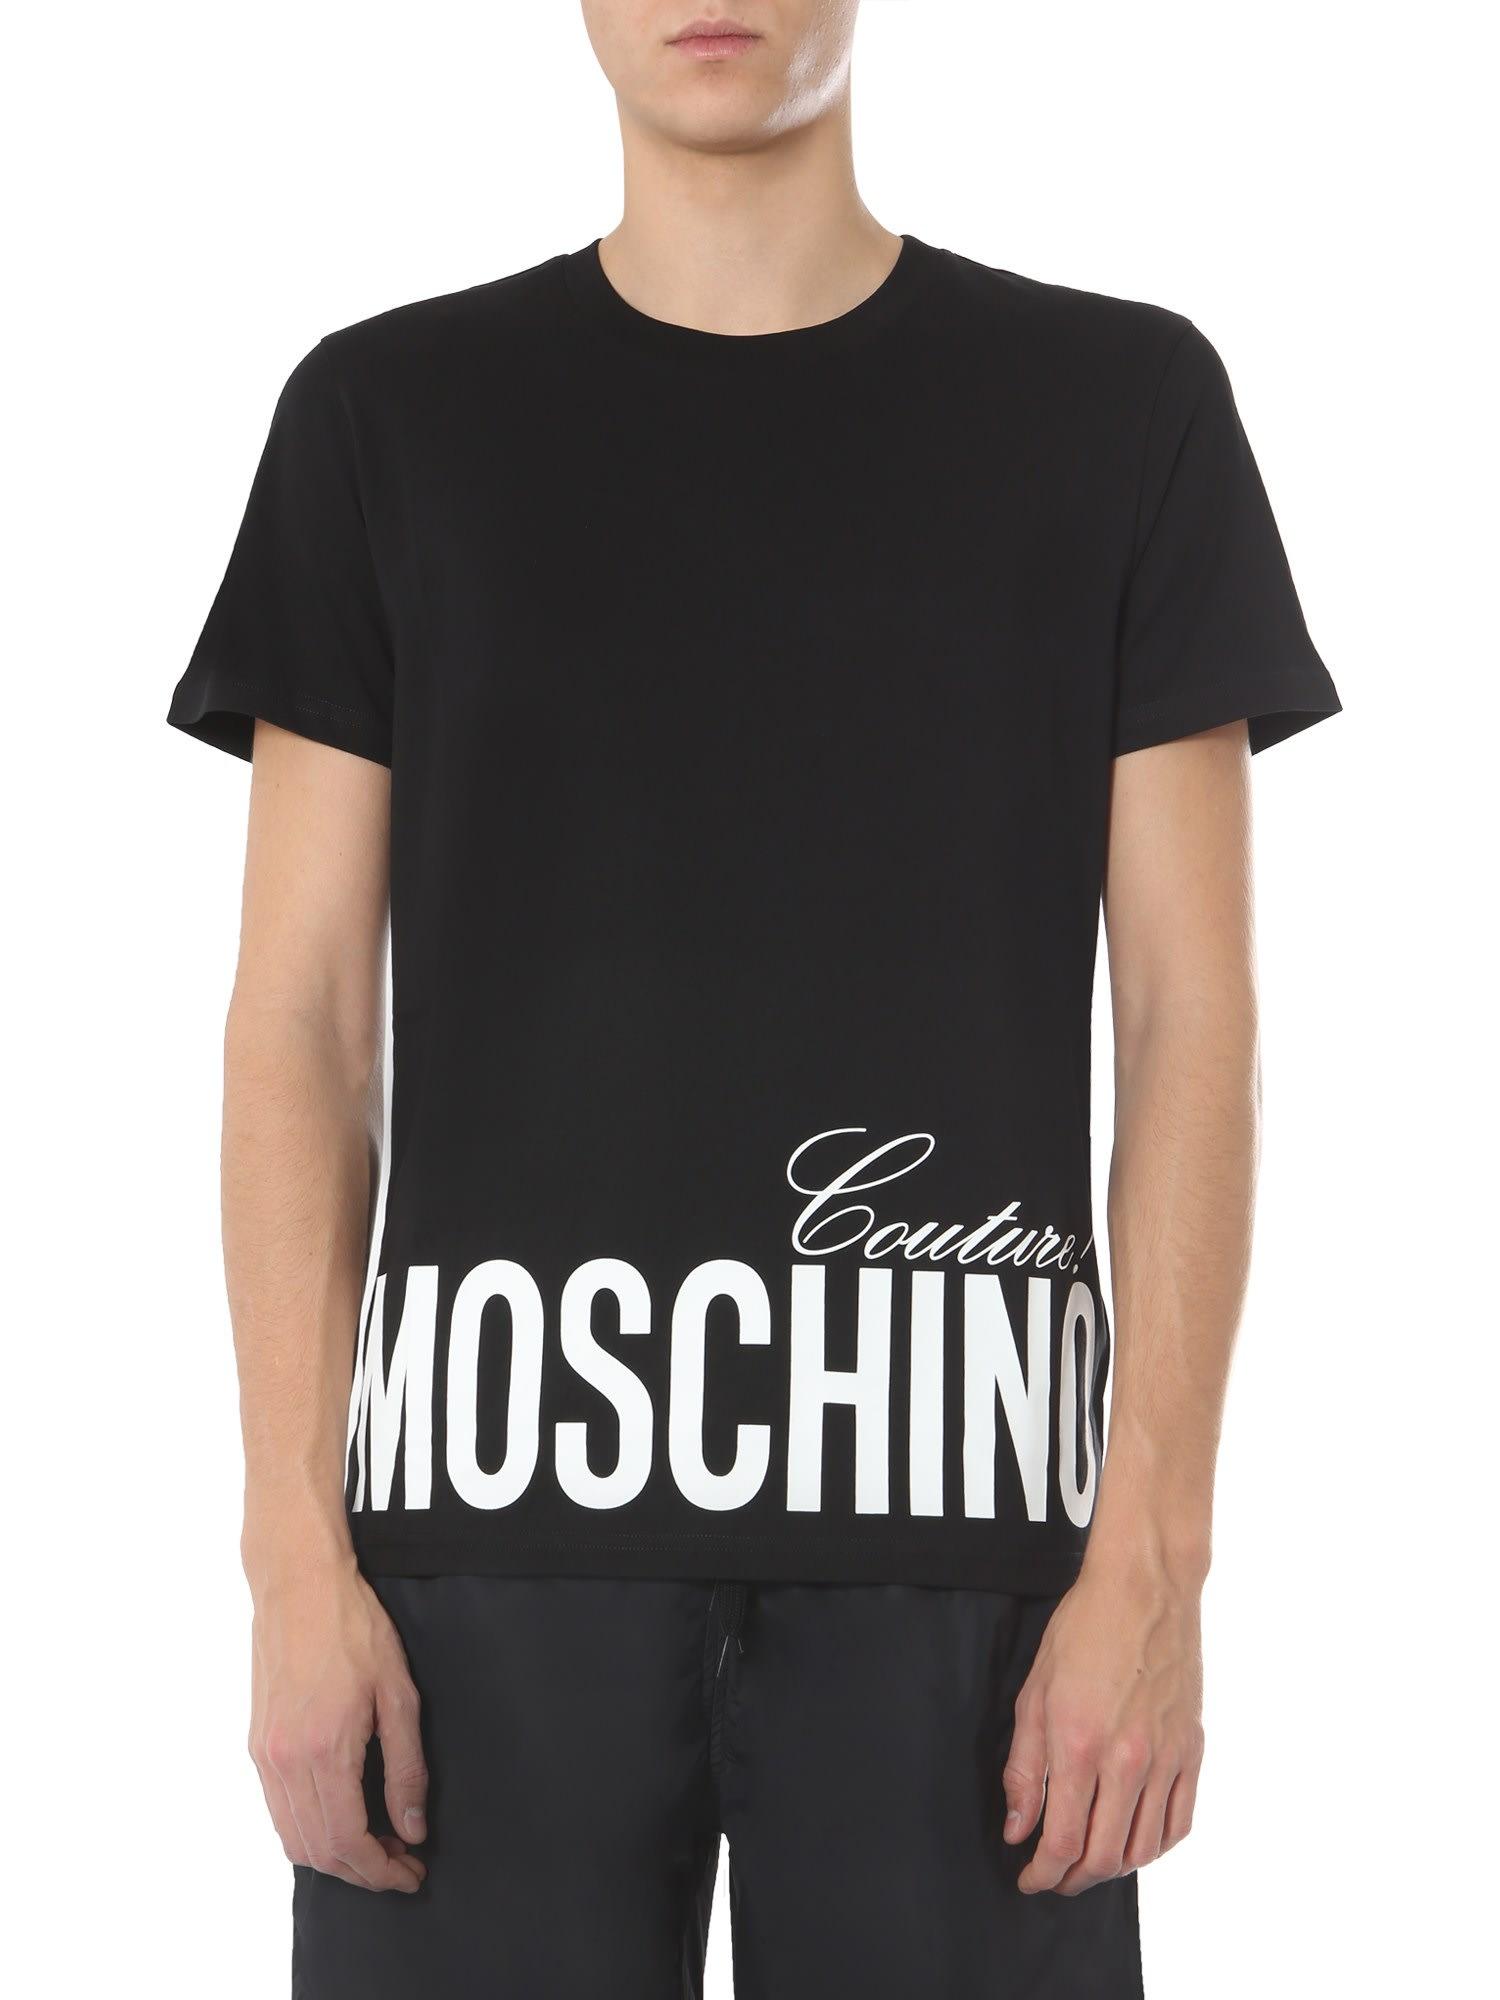 Moschino Cottons ROUND NECK T-SHIRT